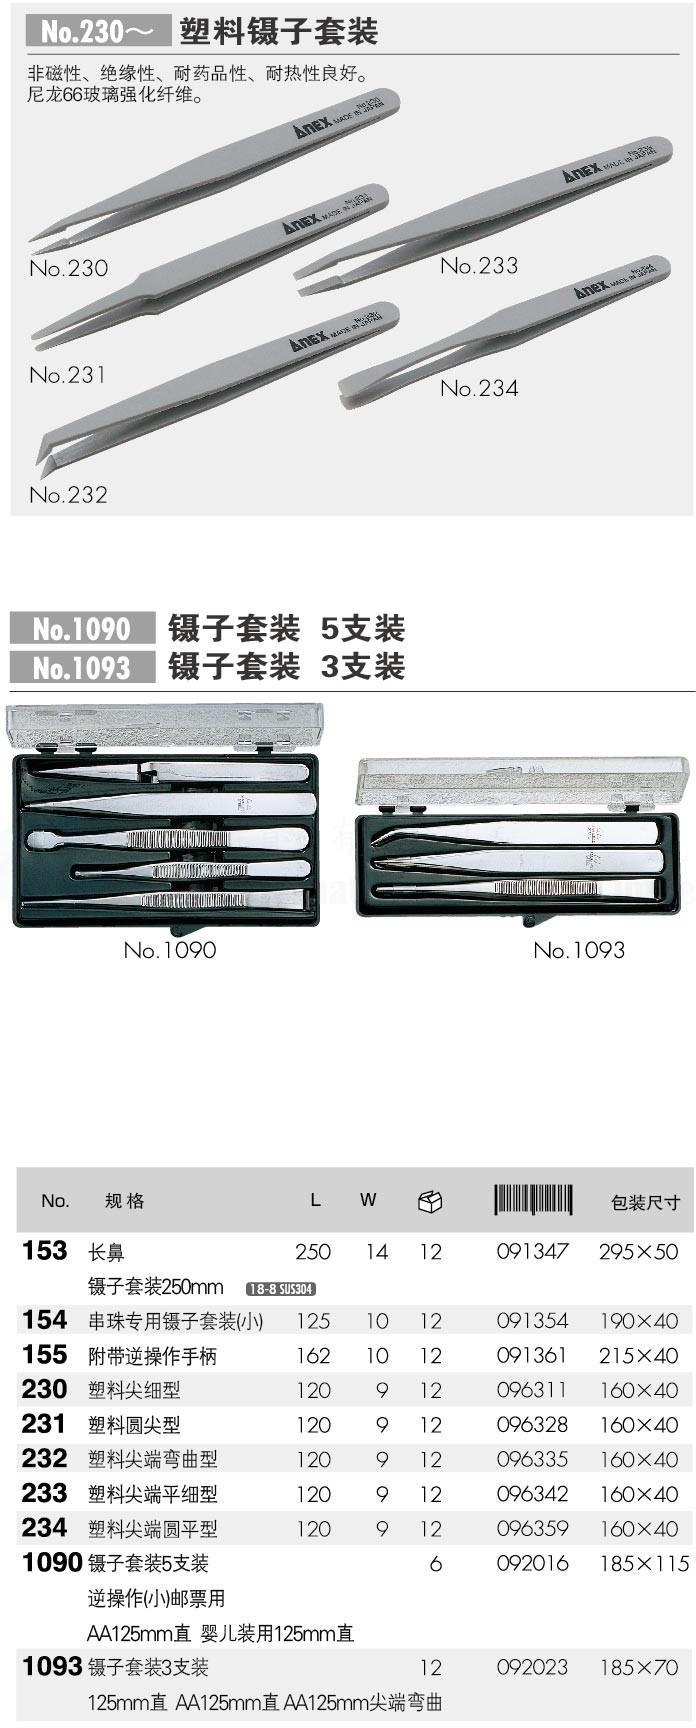 No.230~/No.1090/No.1093